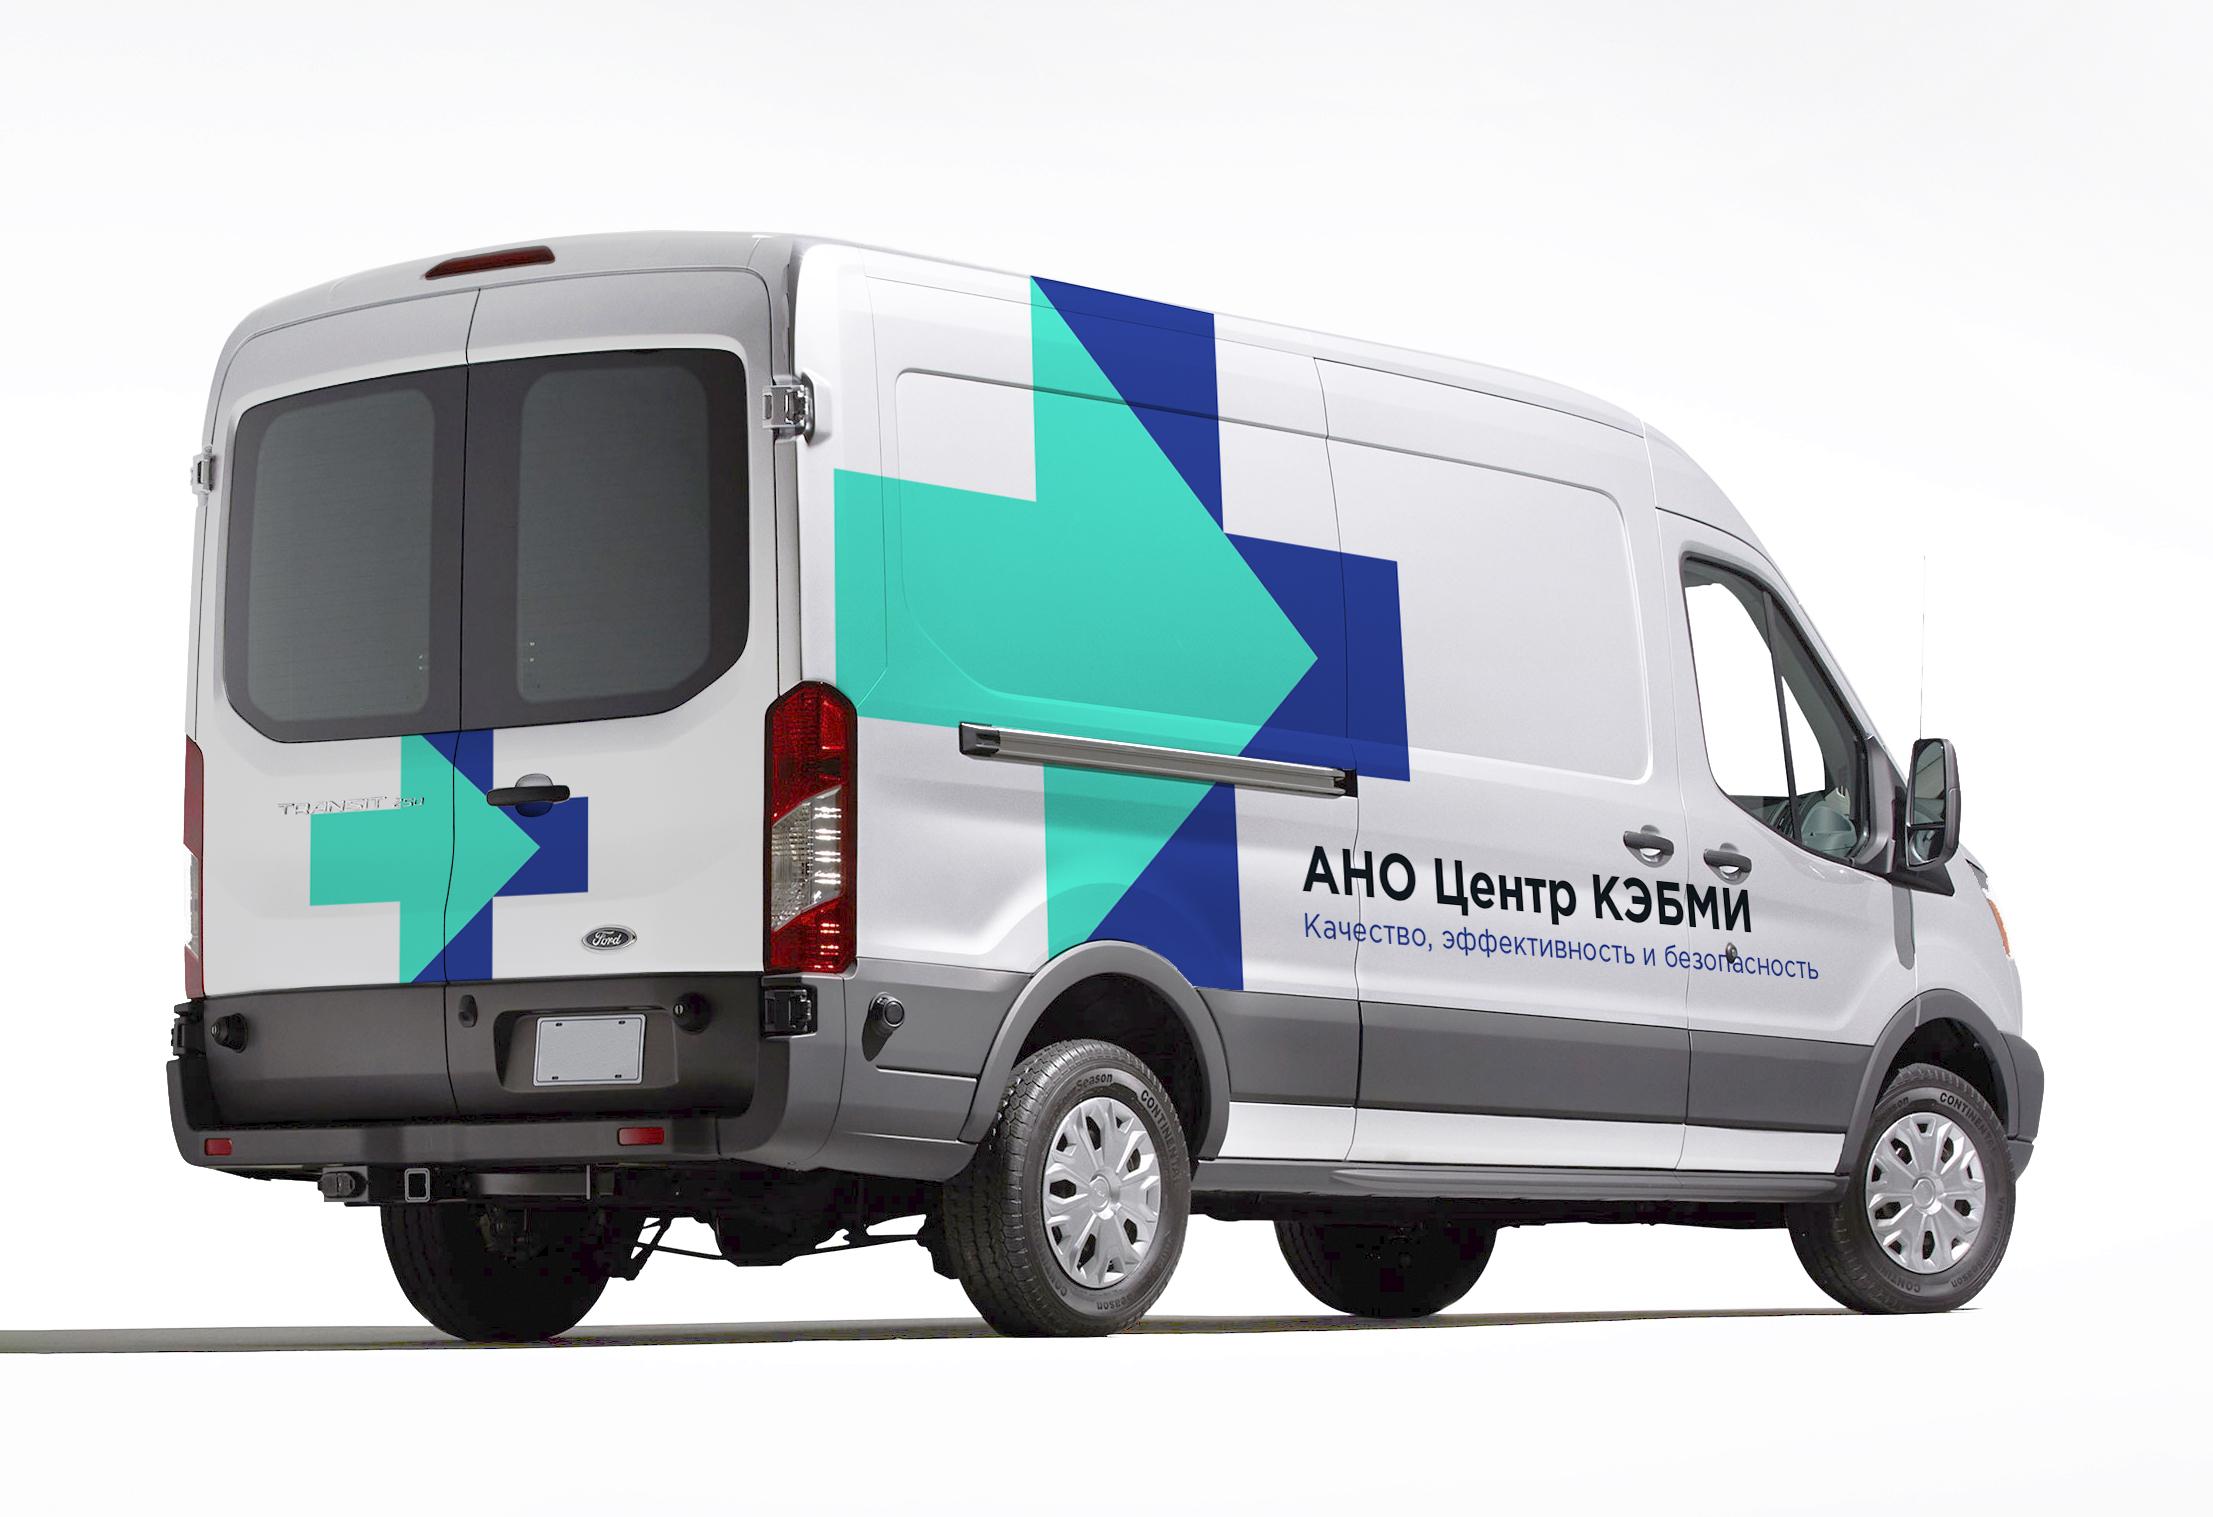 Редизайн логотипа АНО Центр КЭБМИ - BREVIS фото f_7735b2909f9b9023.jpg